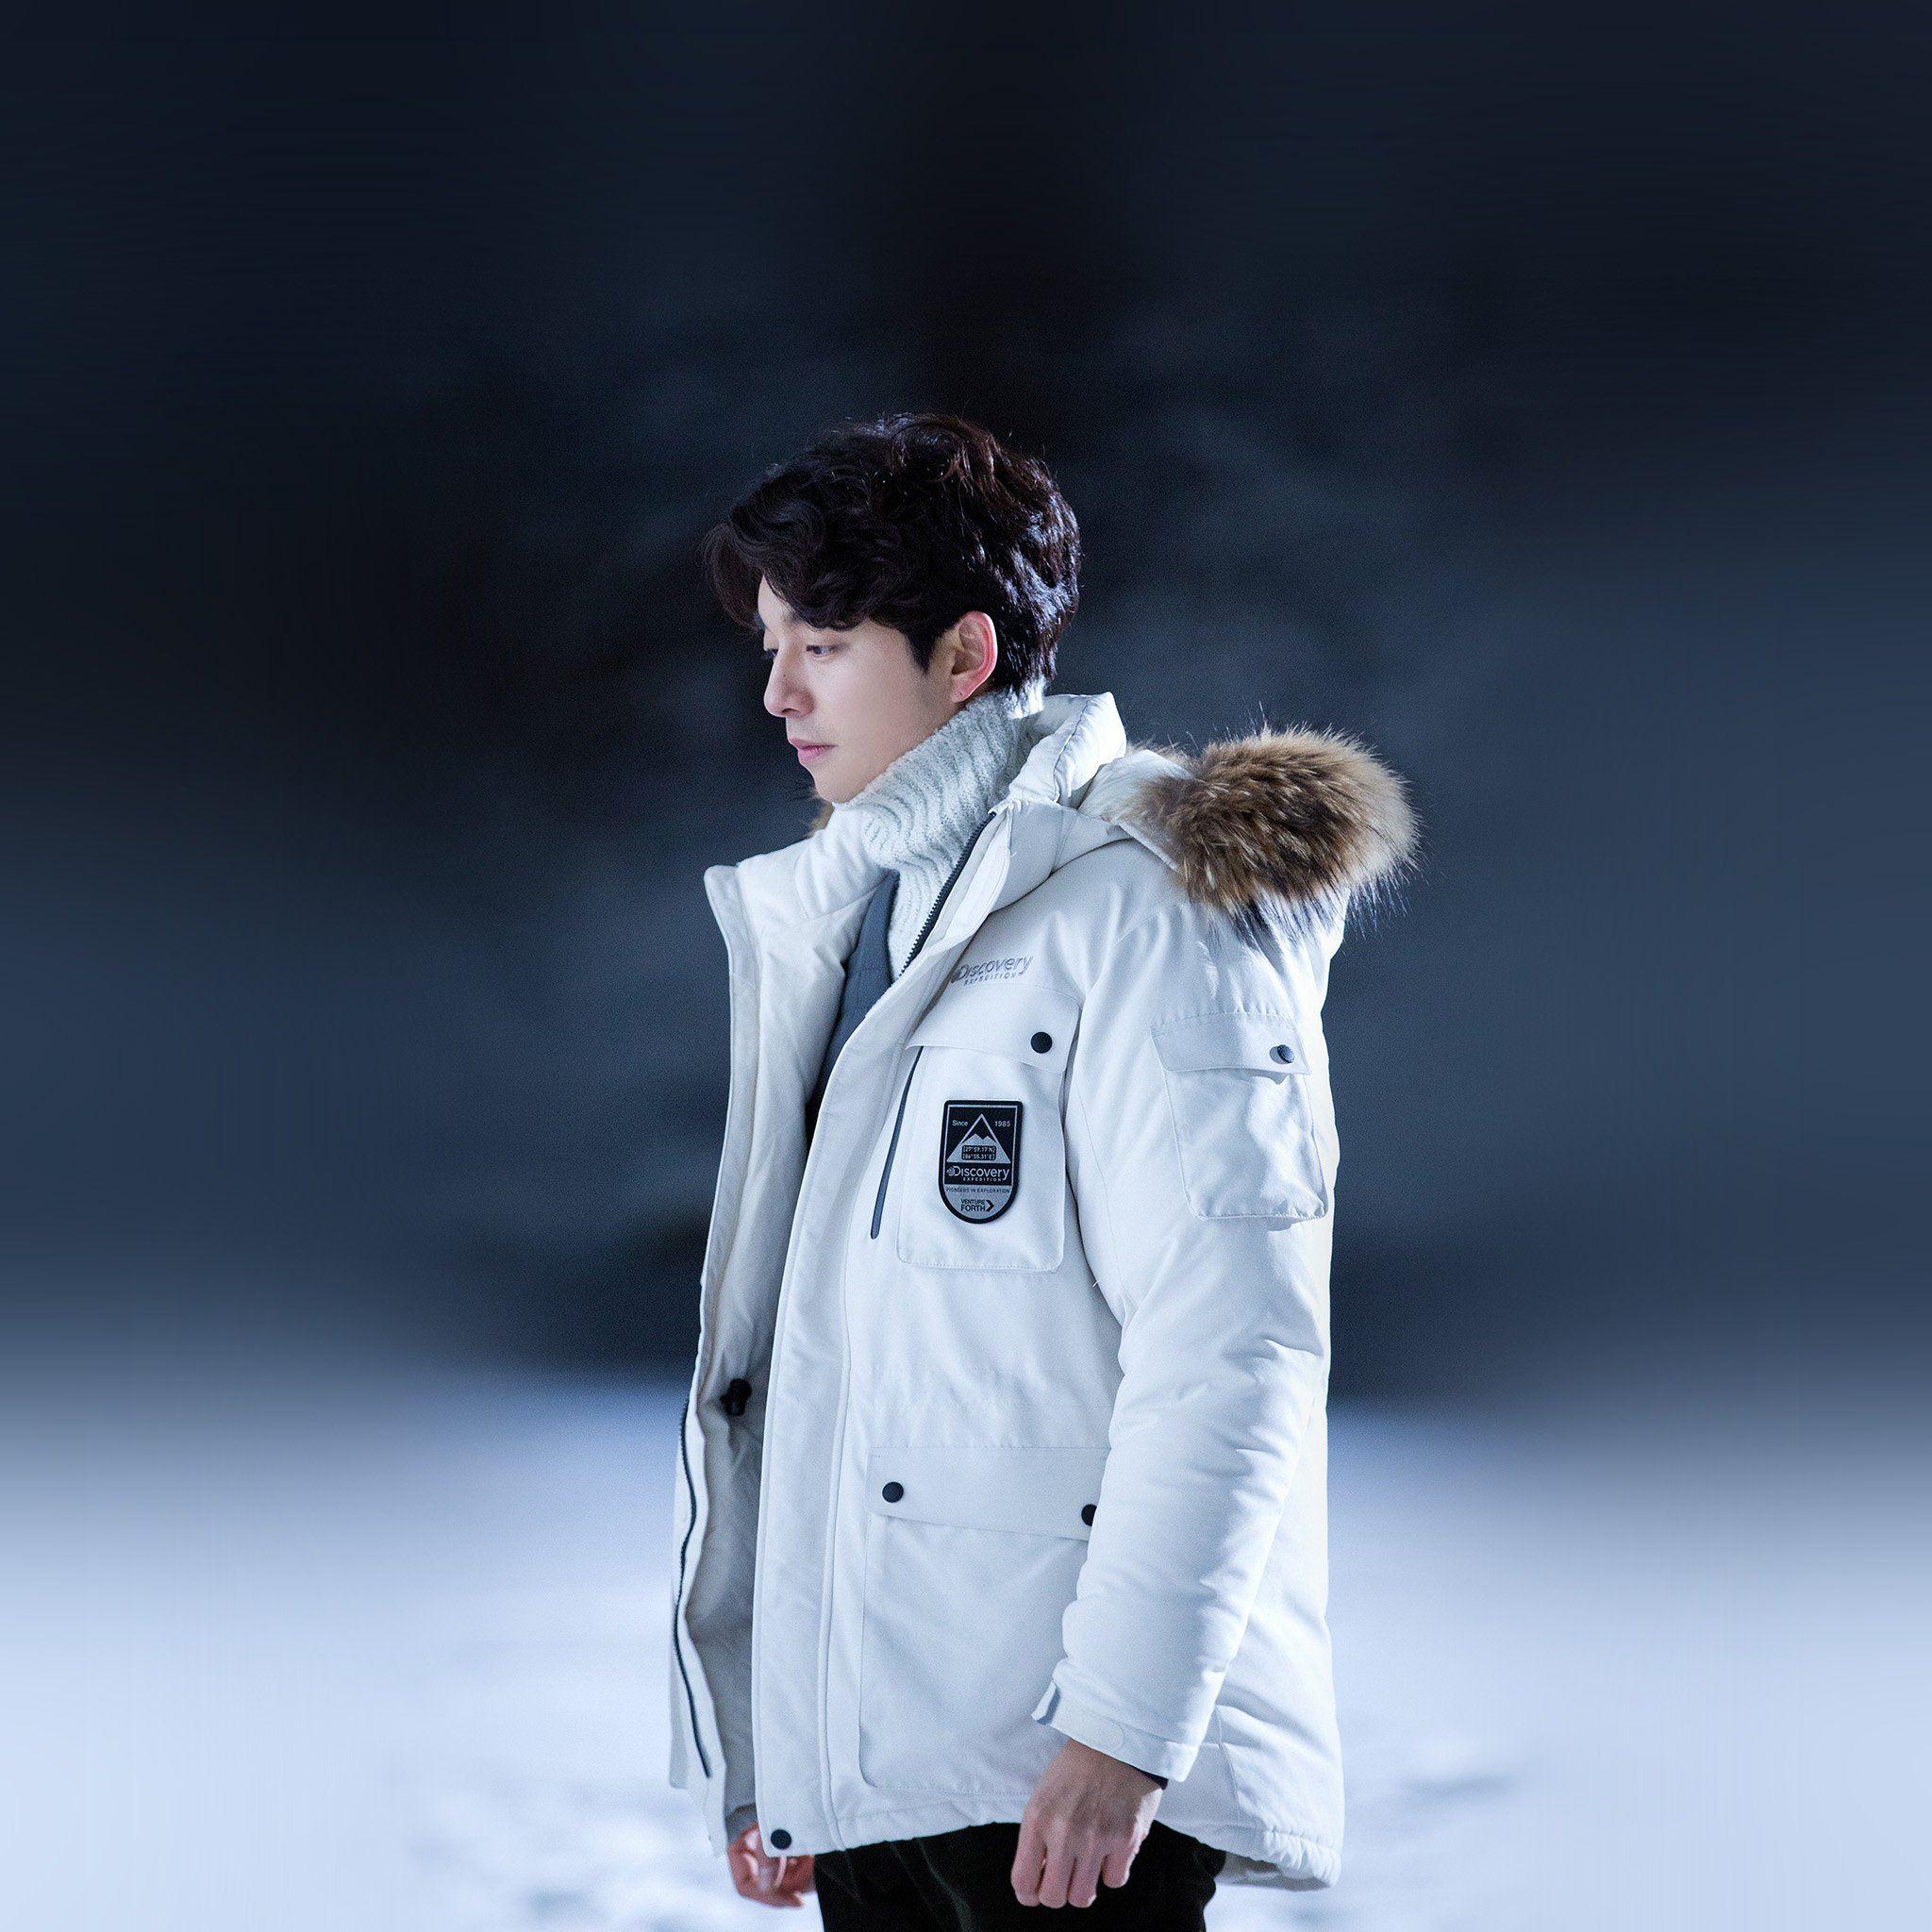 Gongyoo Winter Doggaebi Kpop Ipad Air Wallpapers Free Download